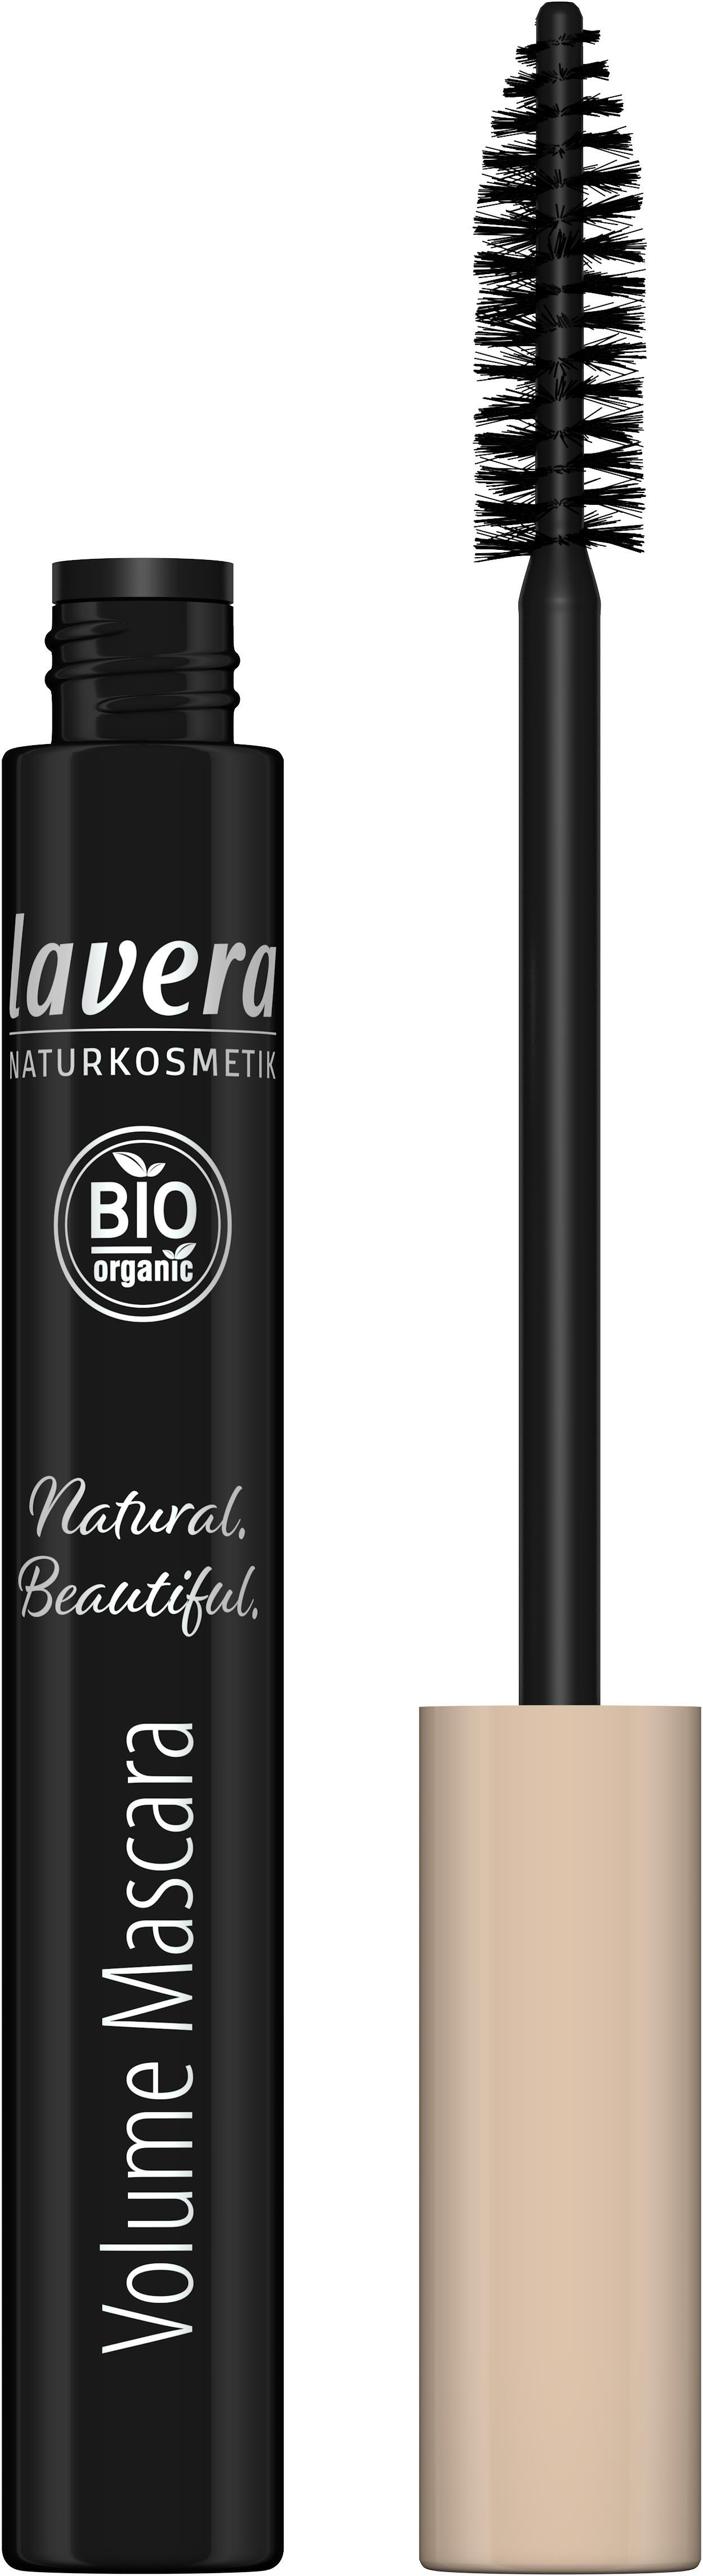 Natural. Beautiful. Volume Mascara